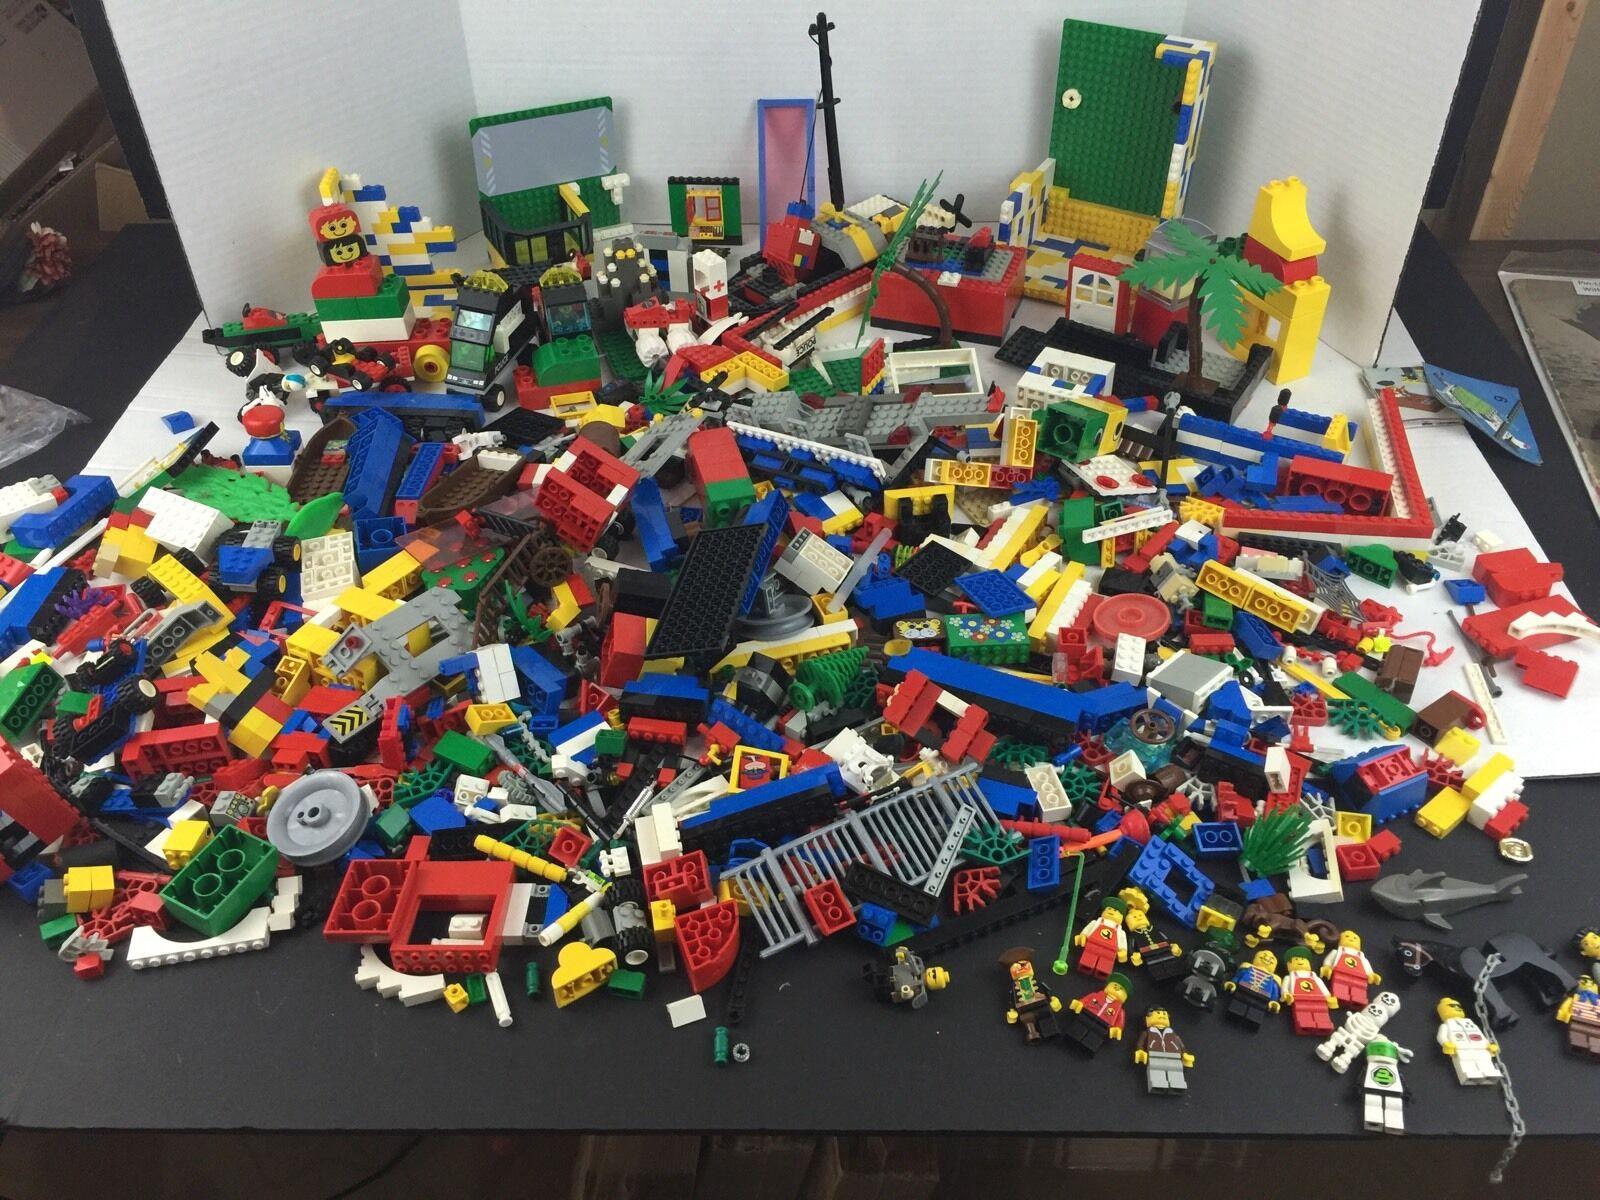 Huge Lego Masse 10 Lbs Bricks Parts Pieces Mixed sets & Mini Figs.